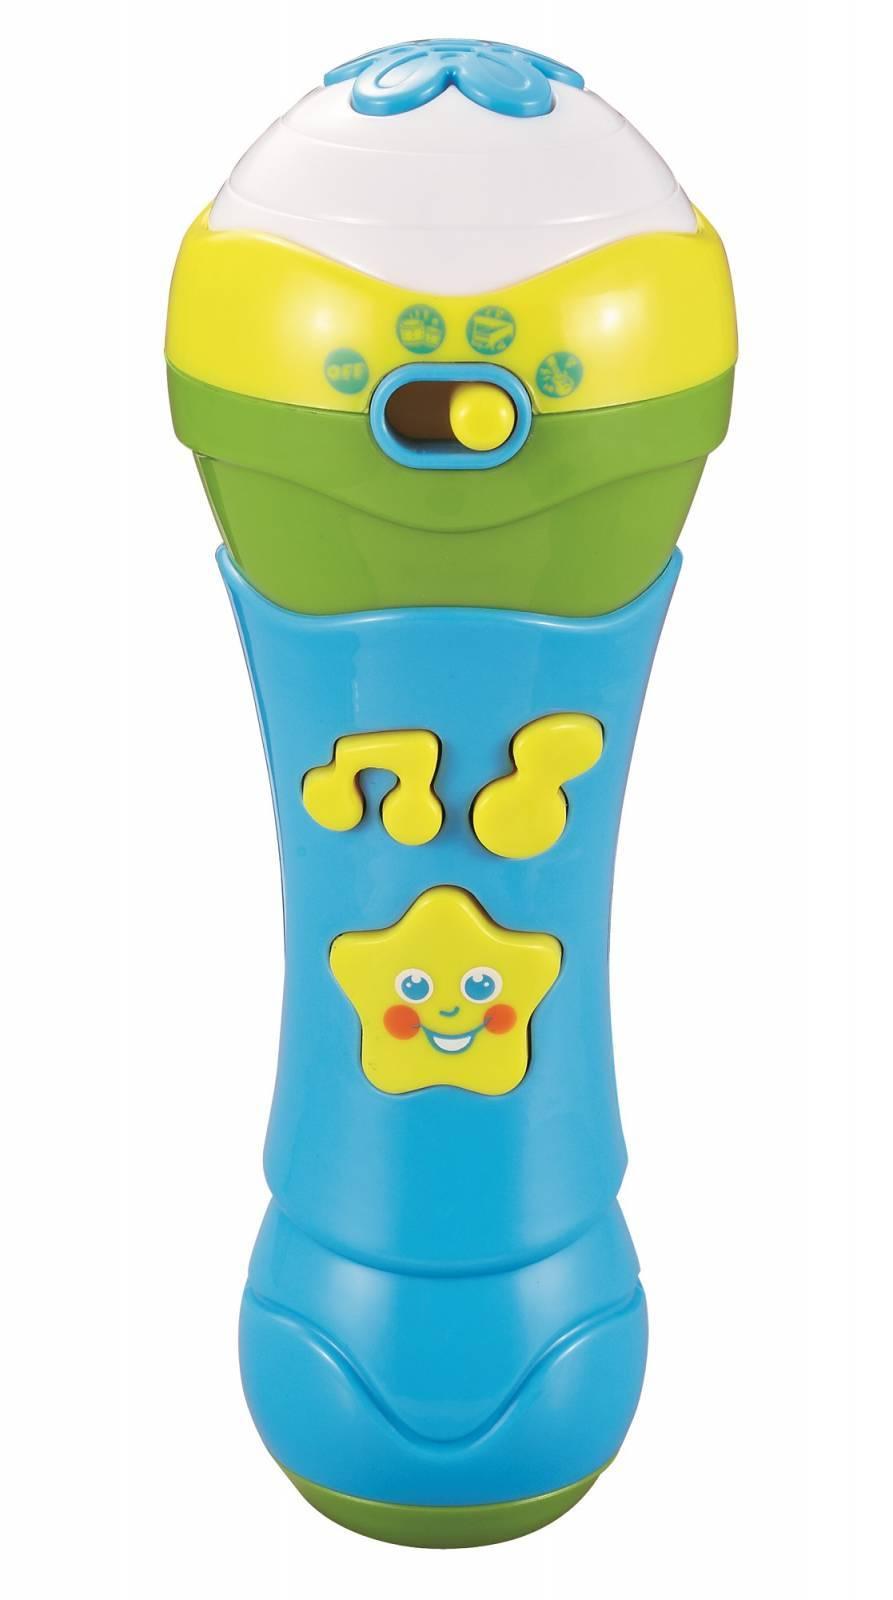 Microfone Divertido - Zoop! Toys ZP00125 - Noy Brinquedos